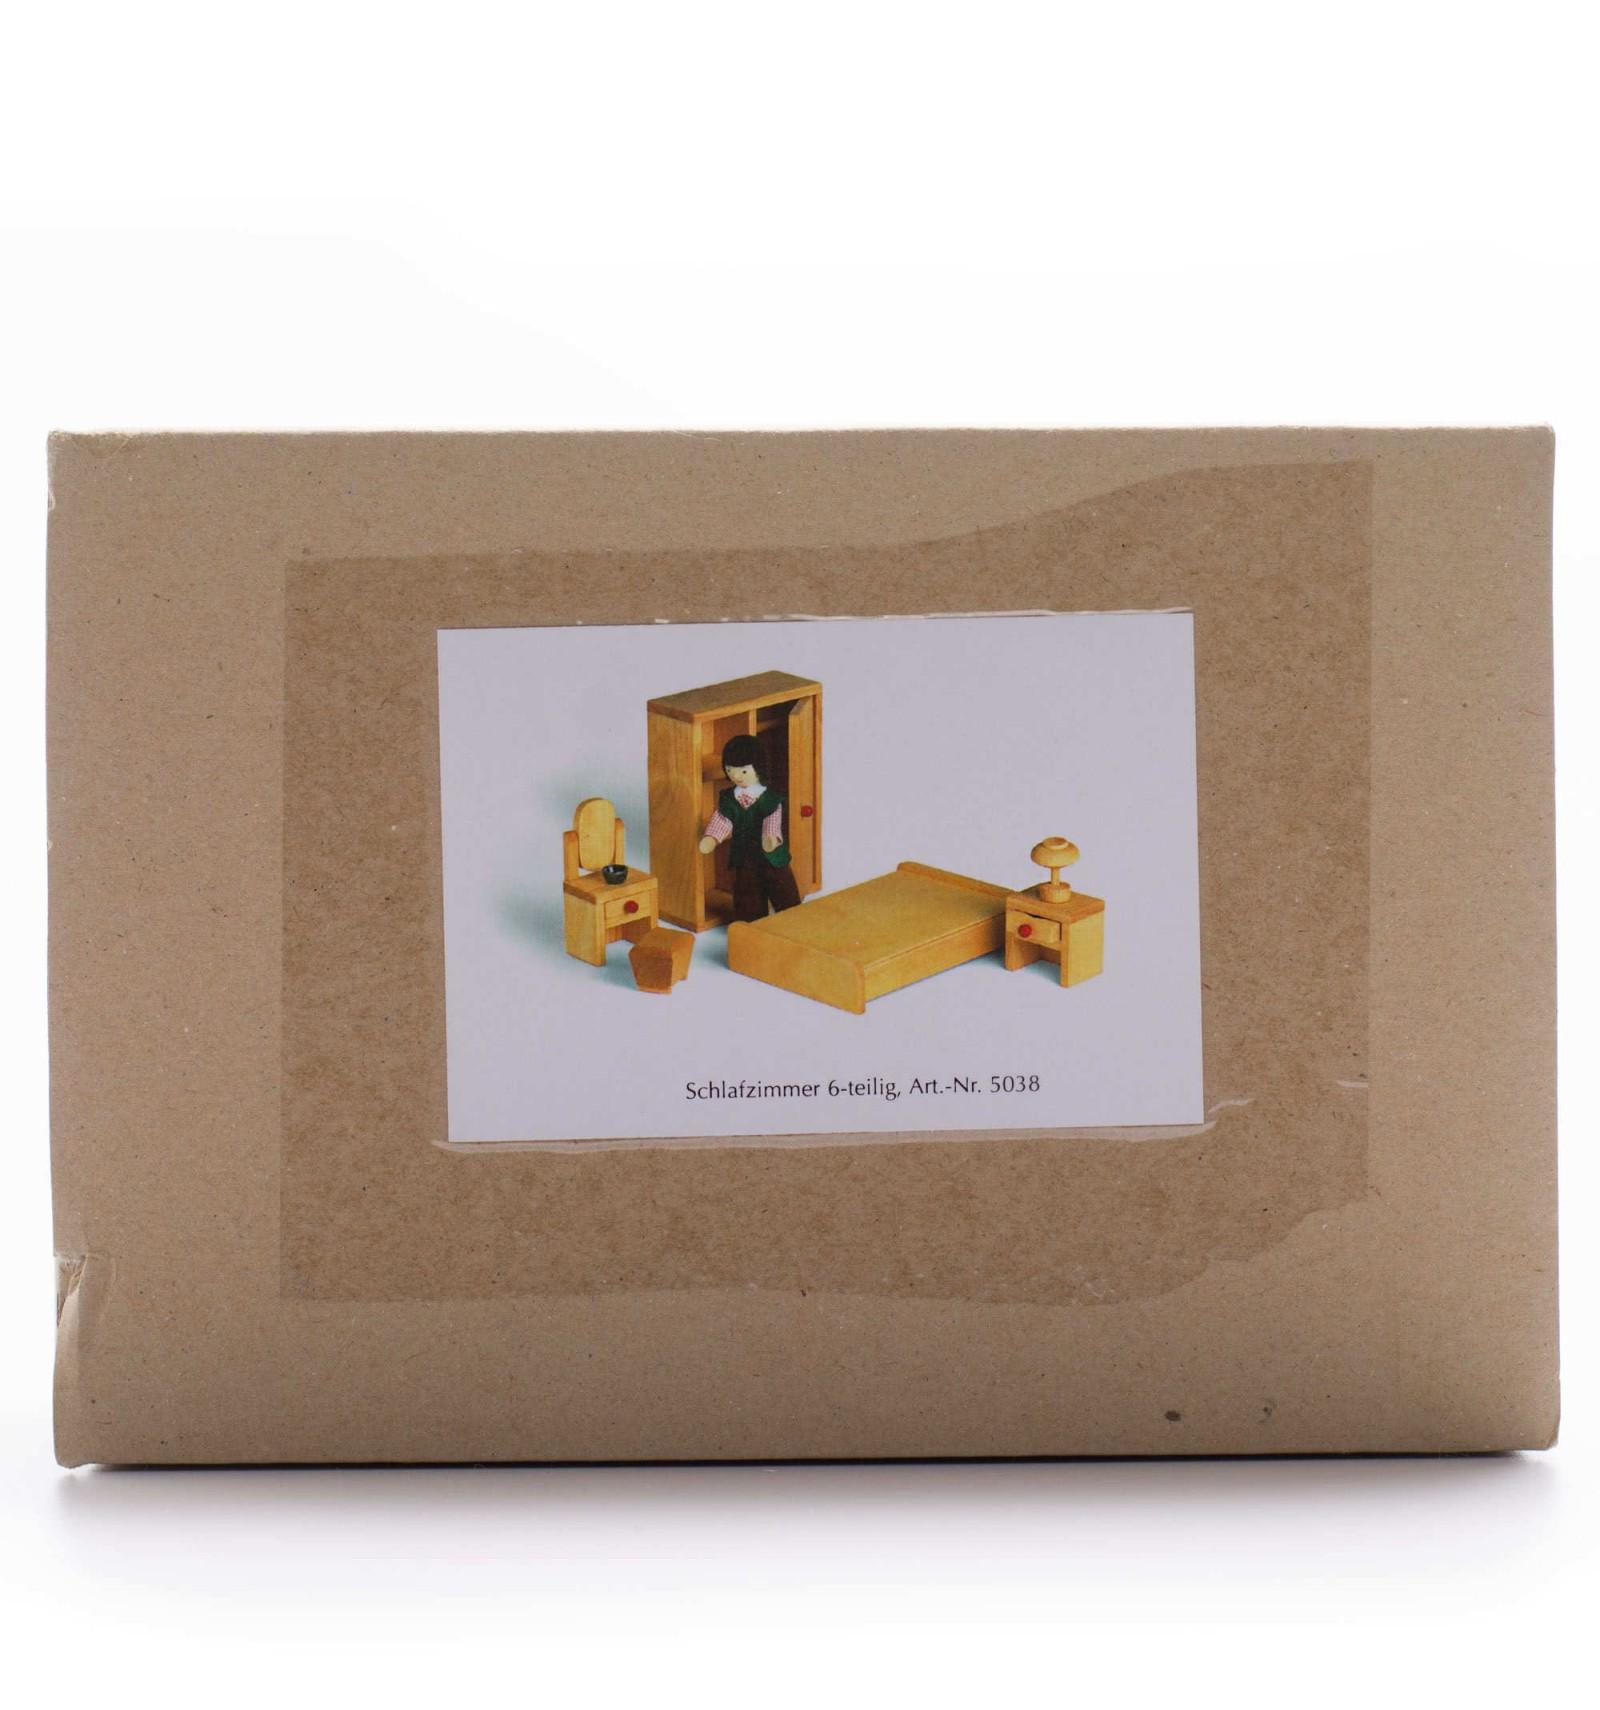 Puppenhaus Schlafzimmer - Holzmöbel aus massivem, geöltem Ho